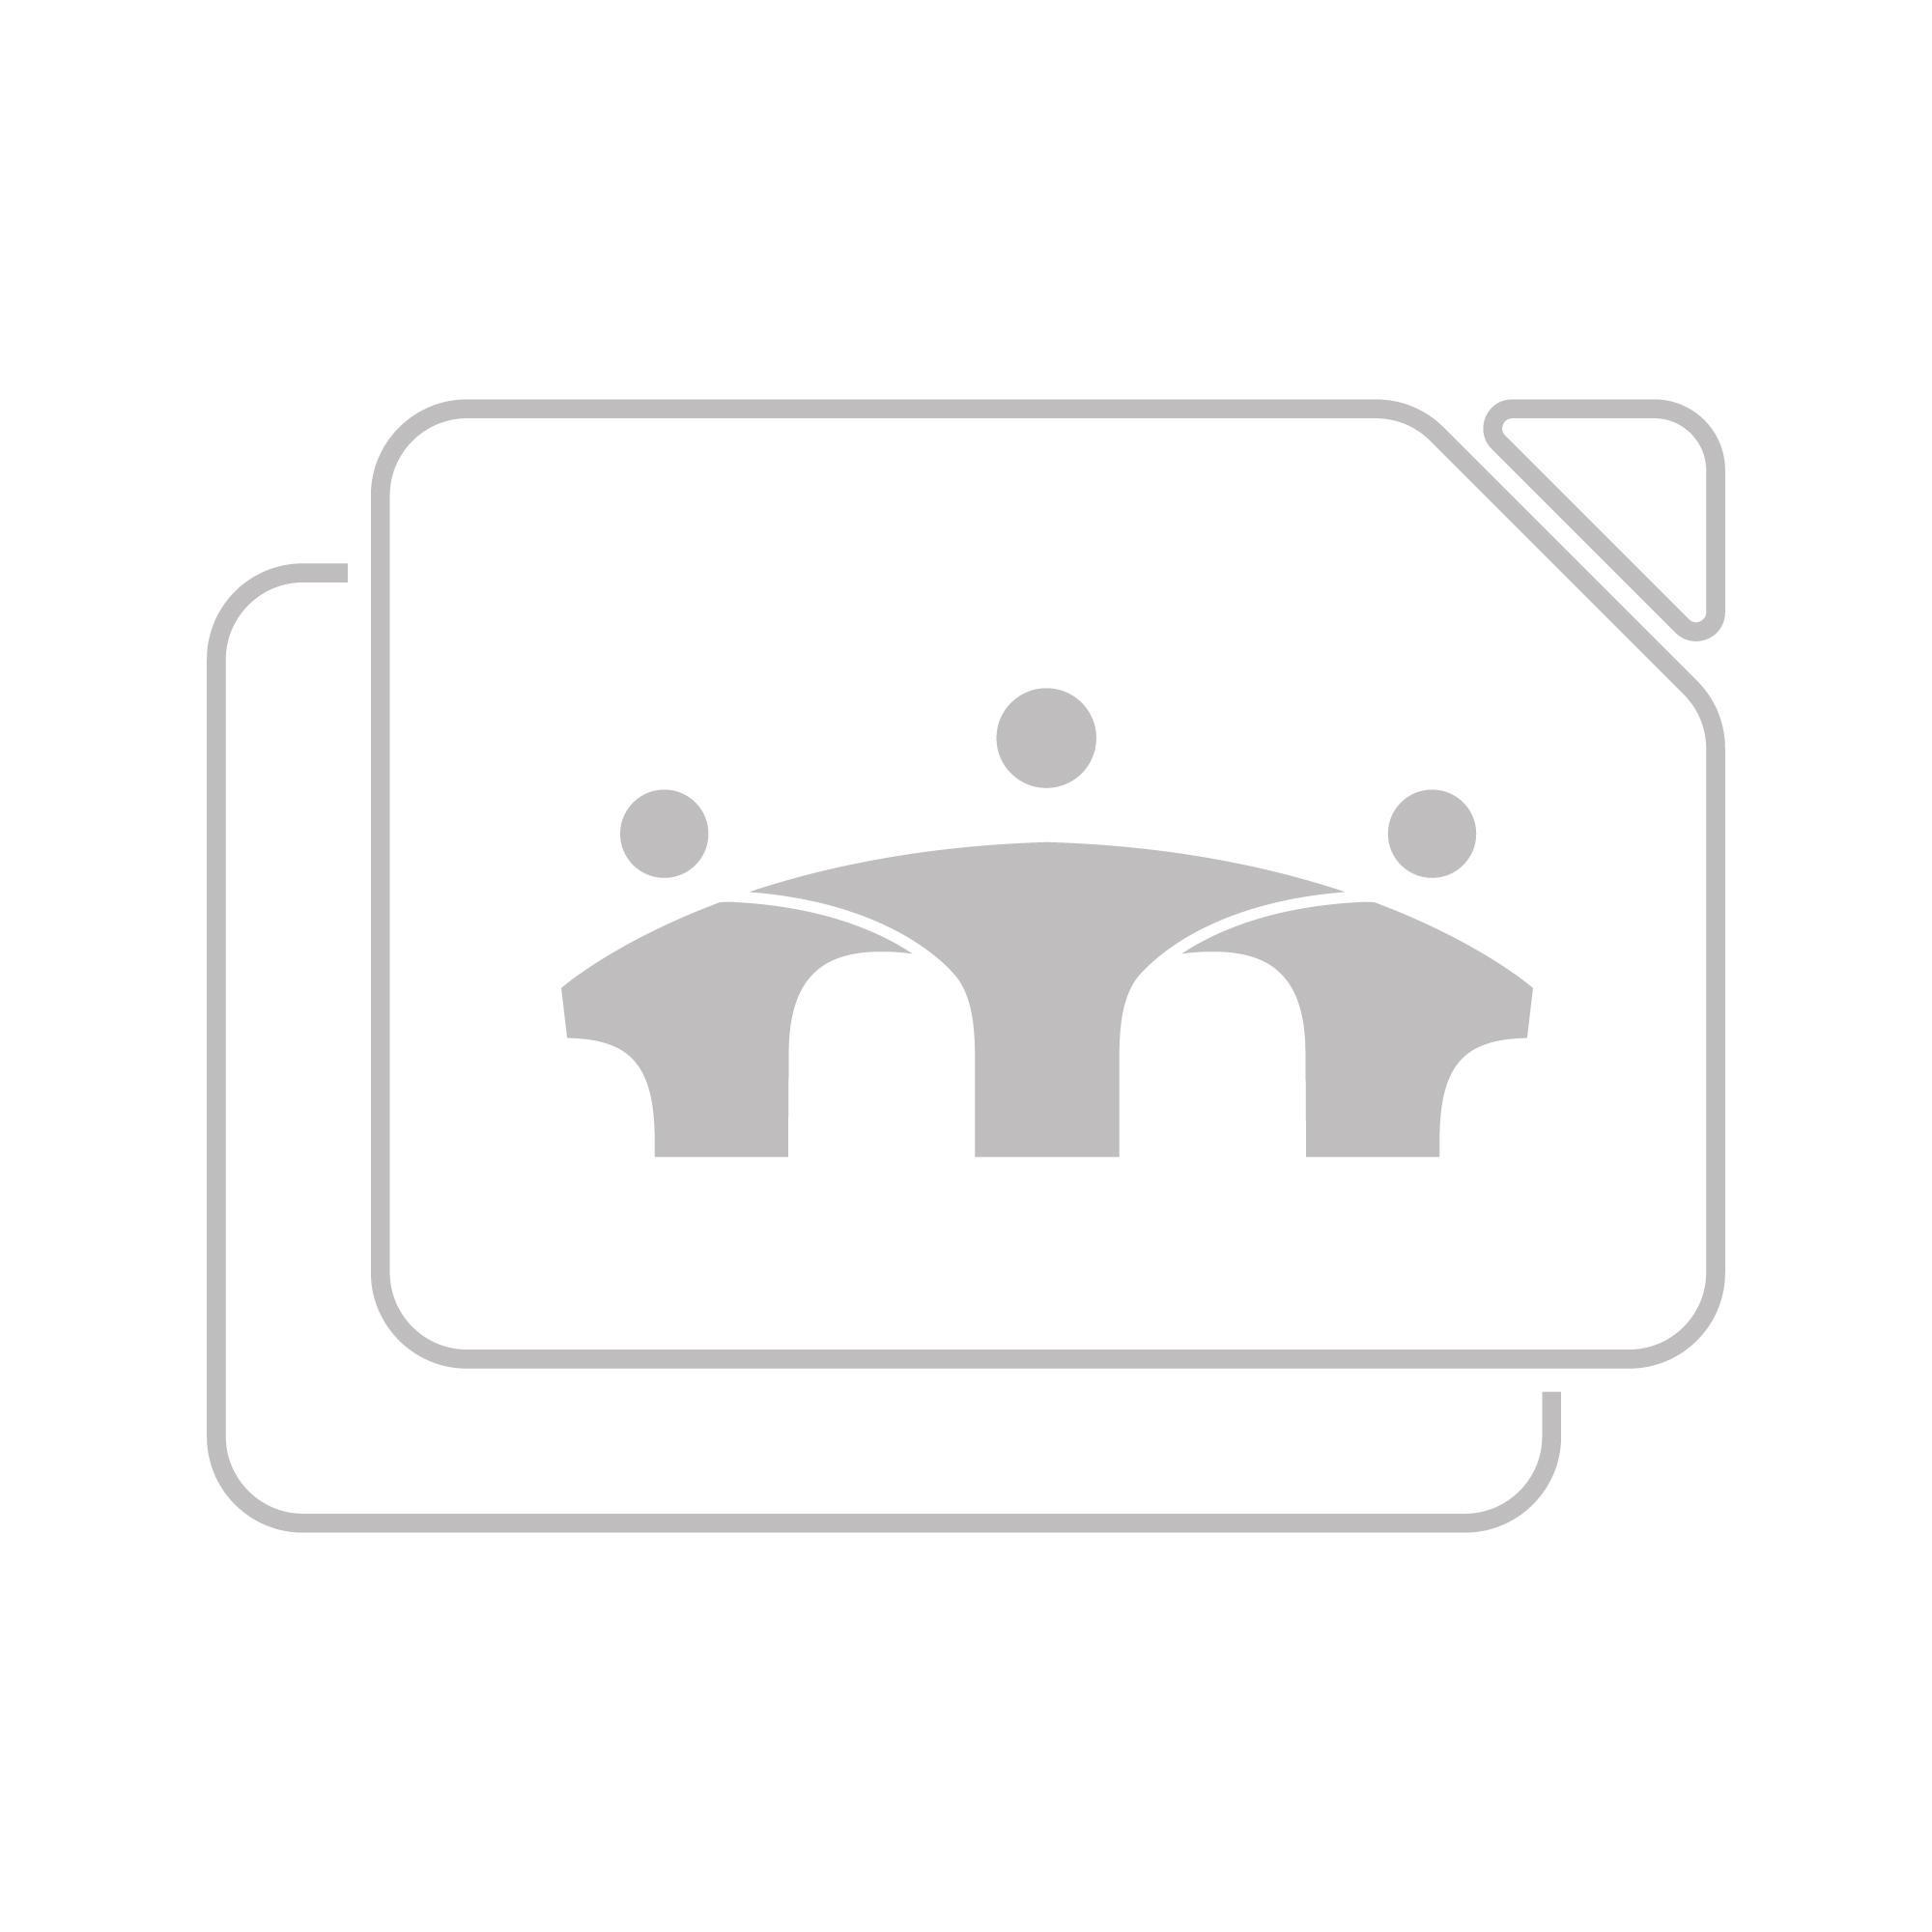 Logitech Rally Bar - OFF-WHITE - EMEA